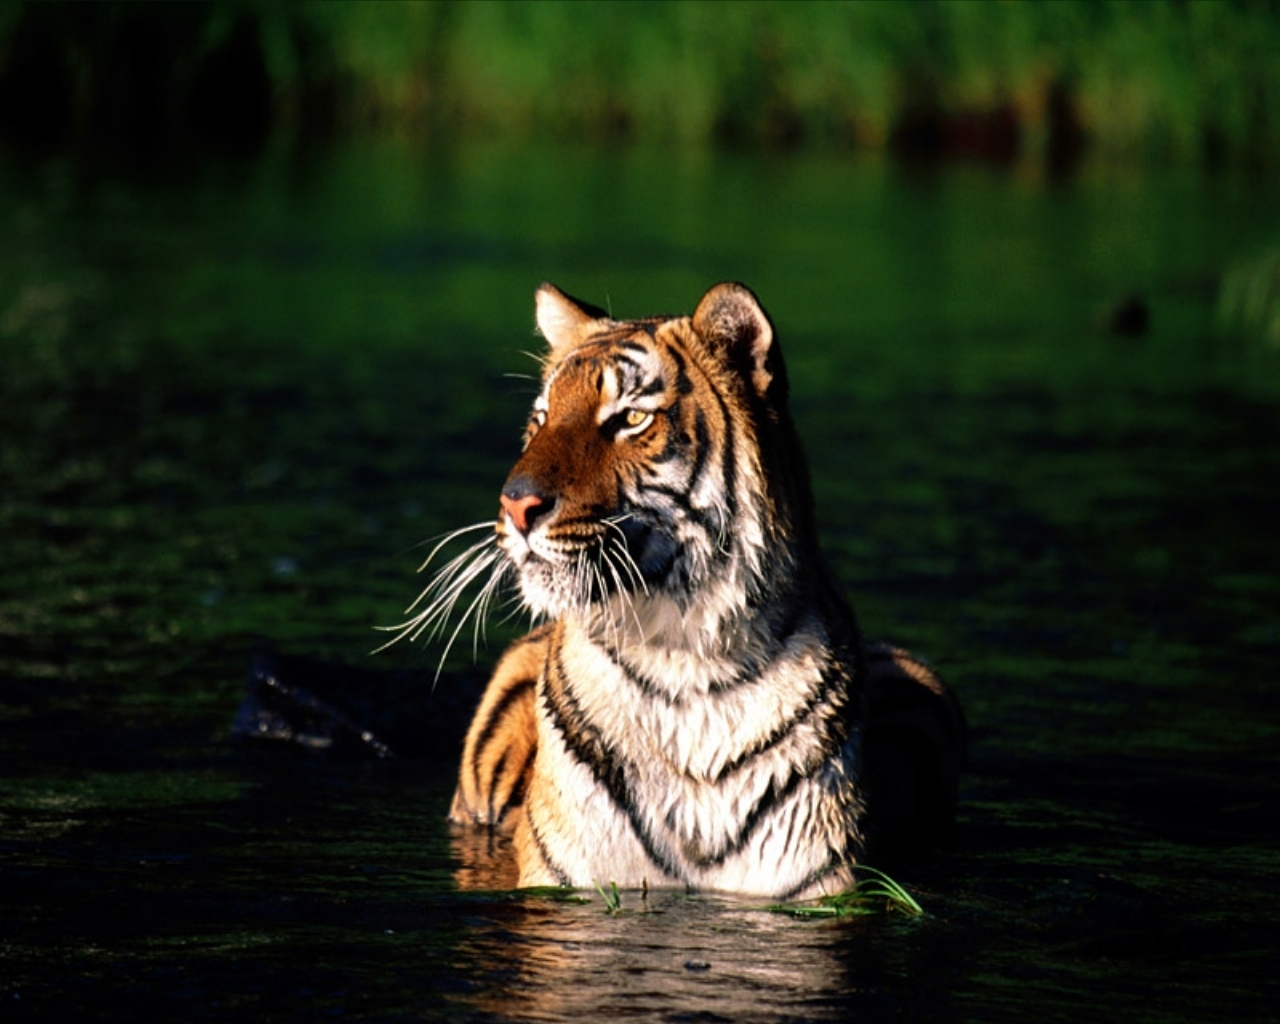 The animal kingdom tigers